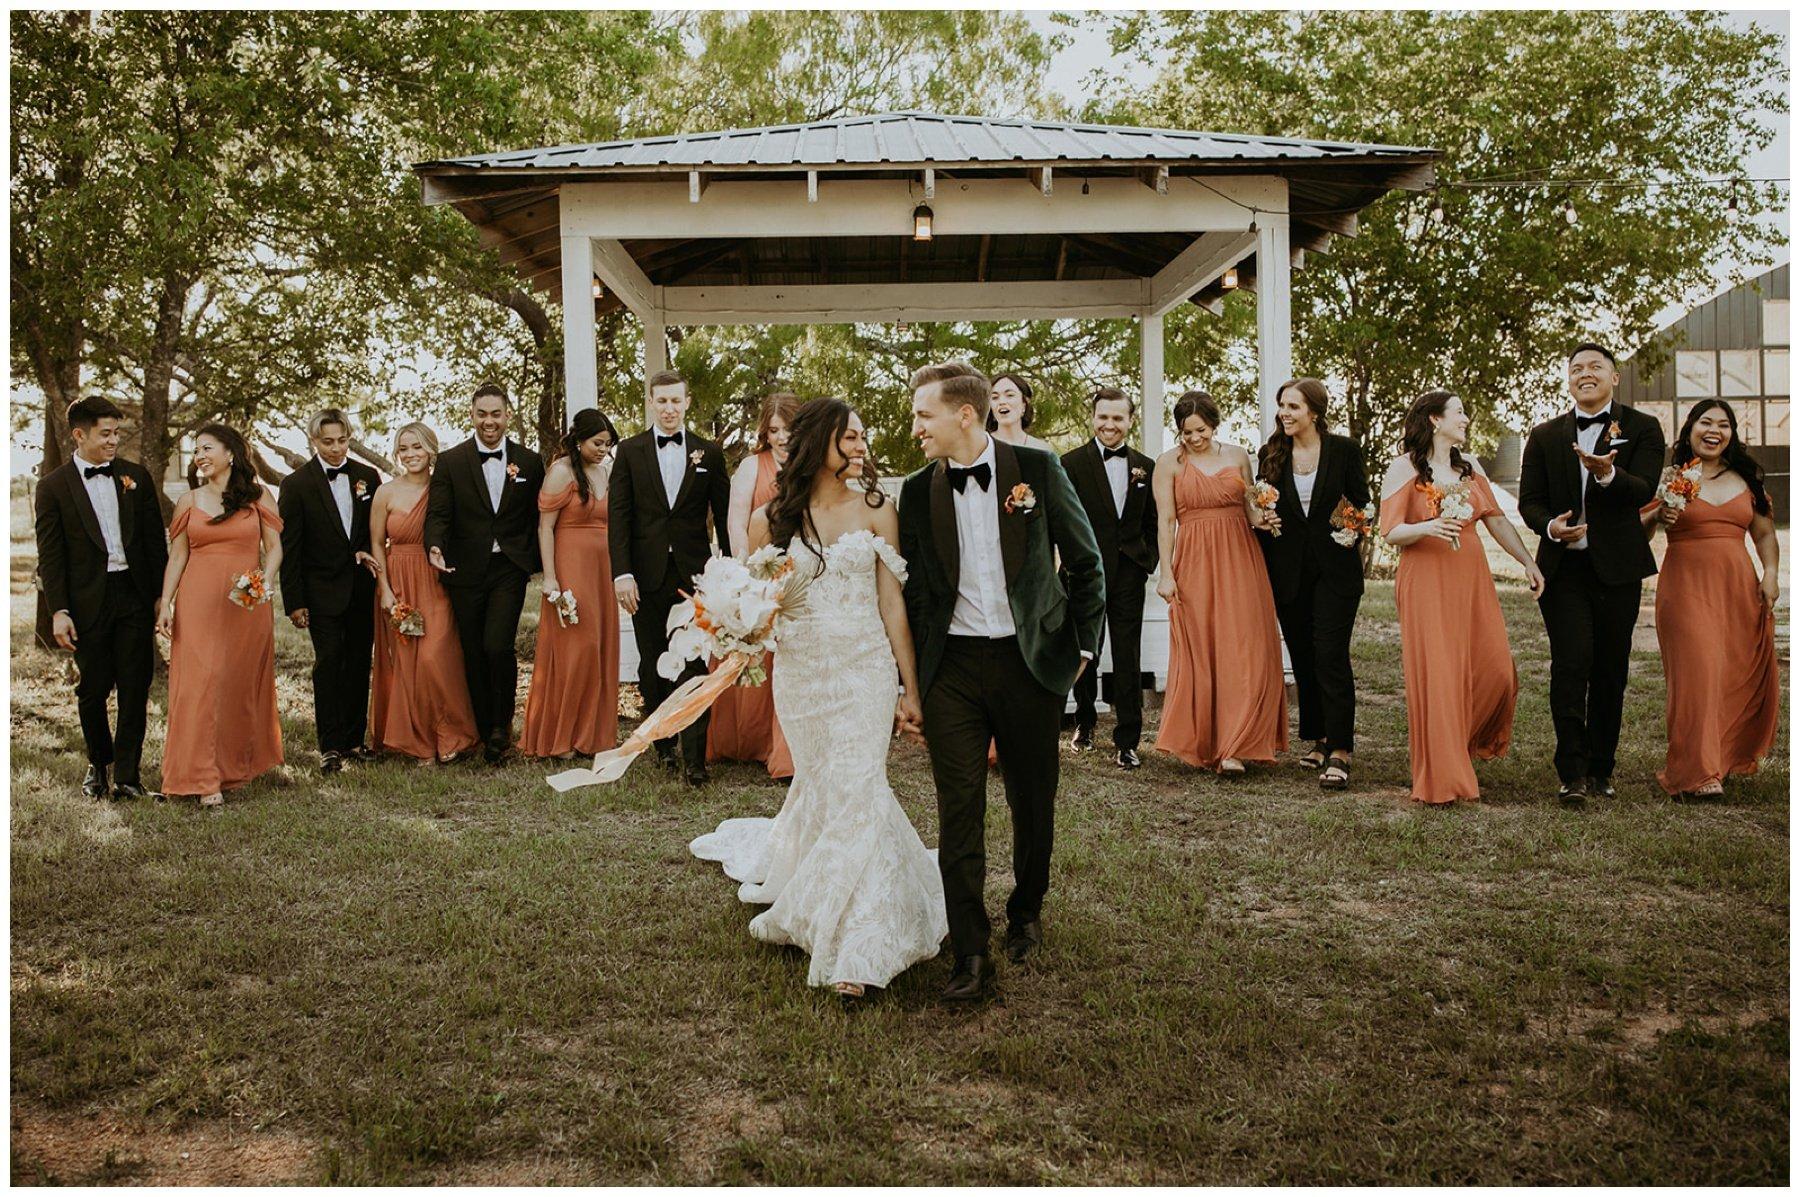 bridesmaids wearing rusty orange bridesmaid dresses